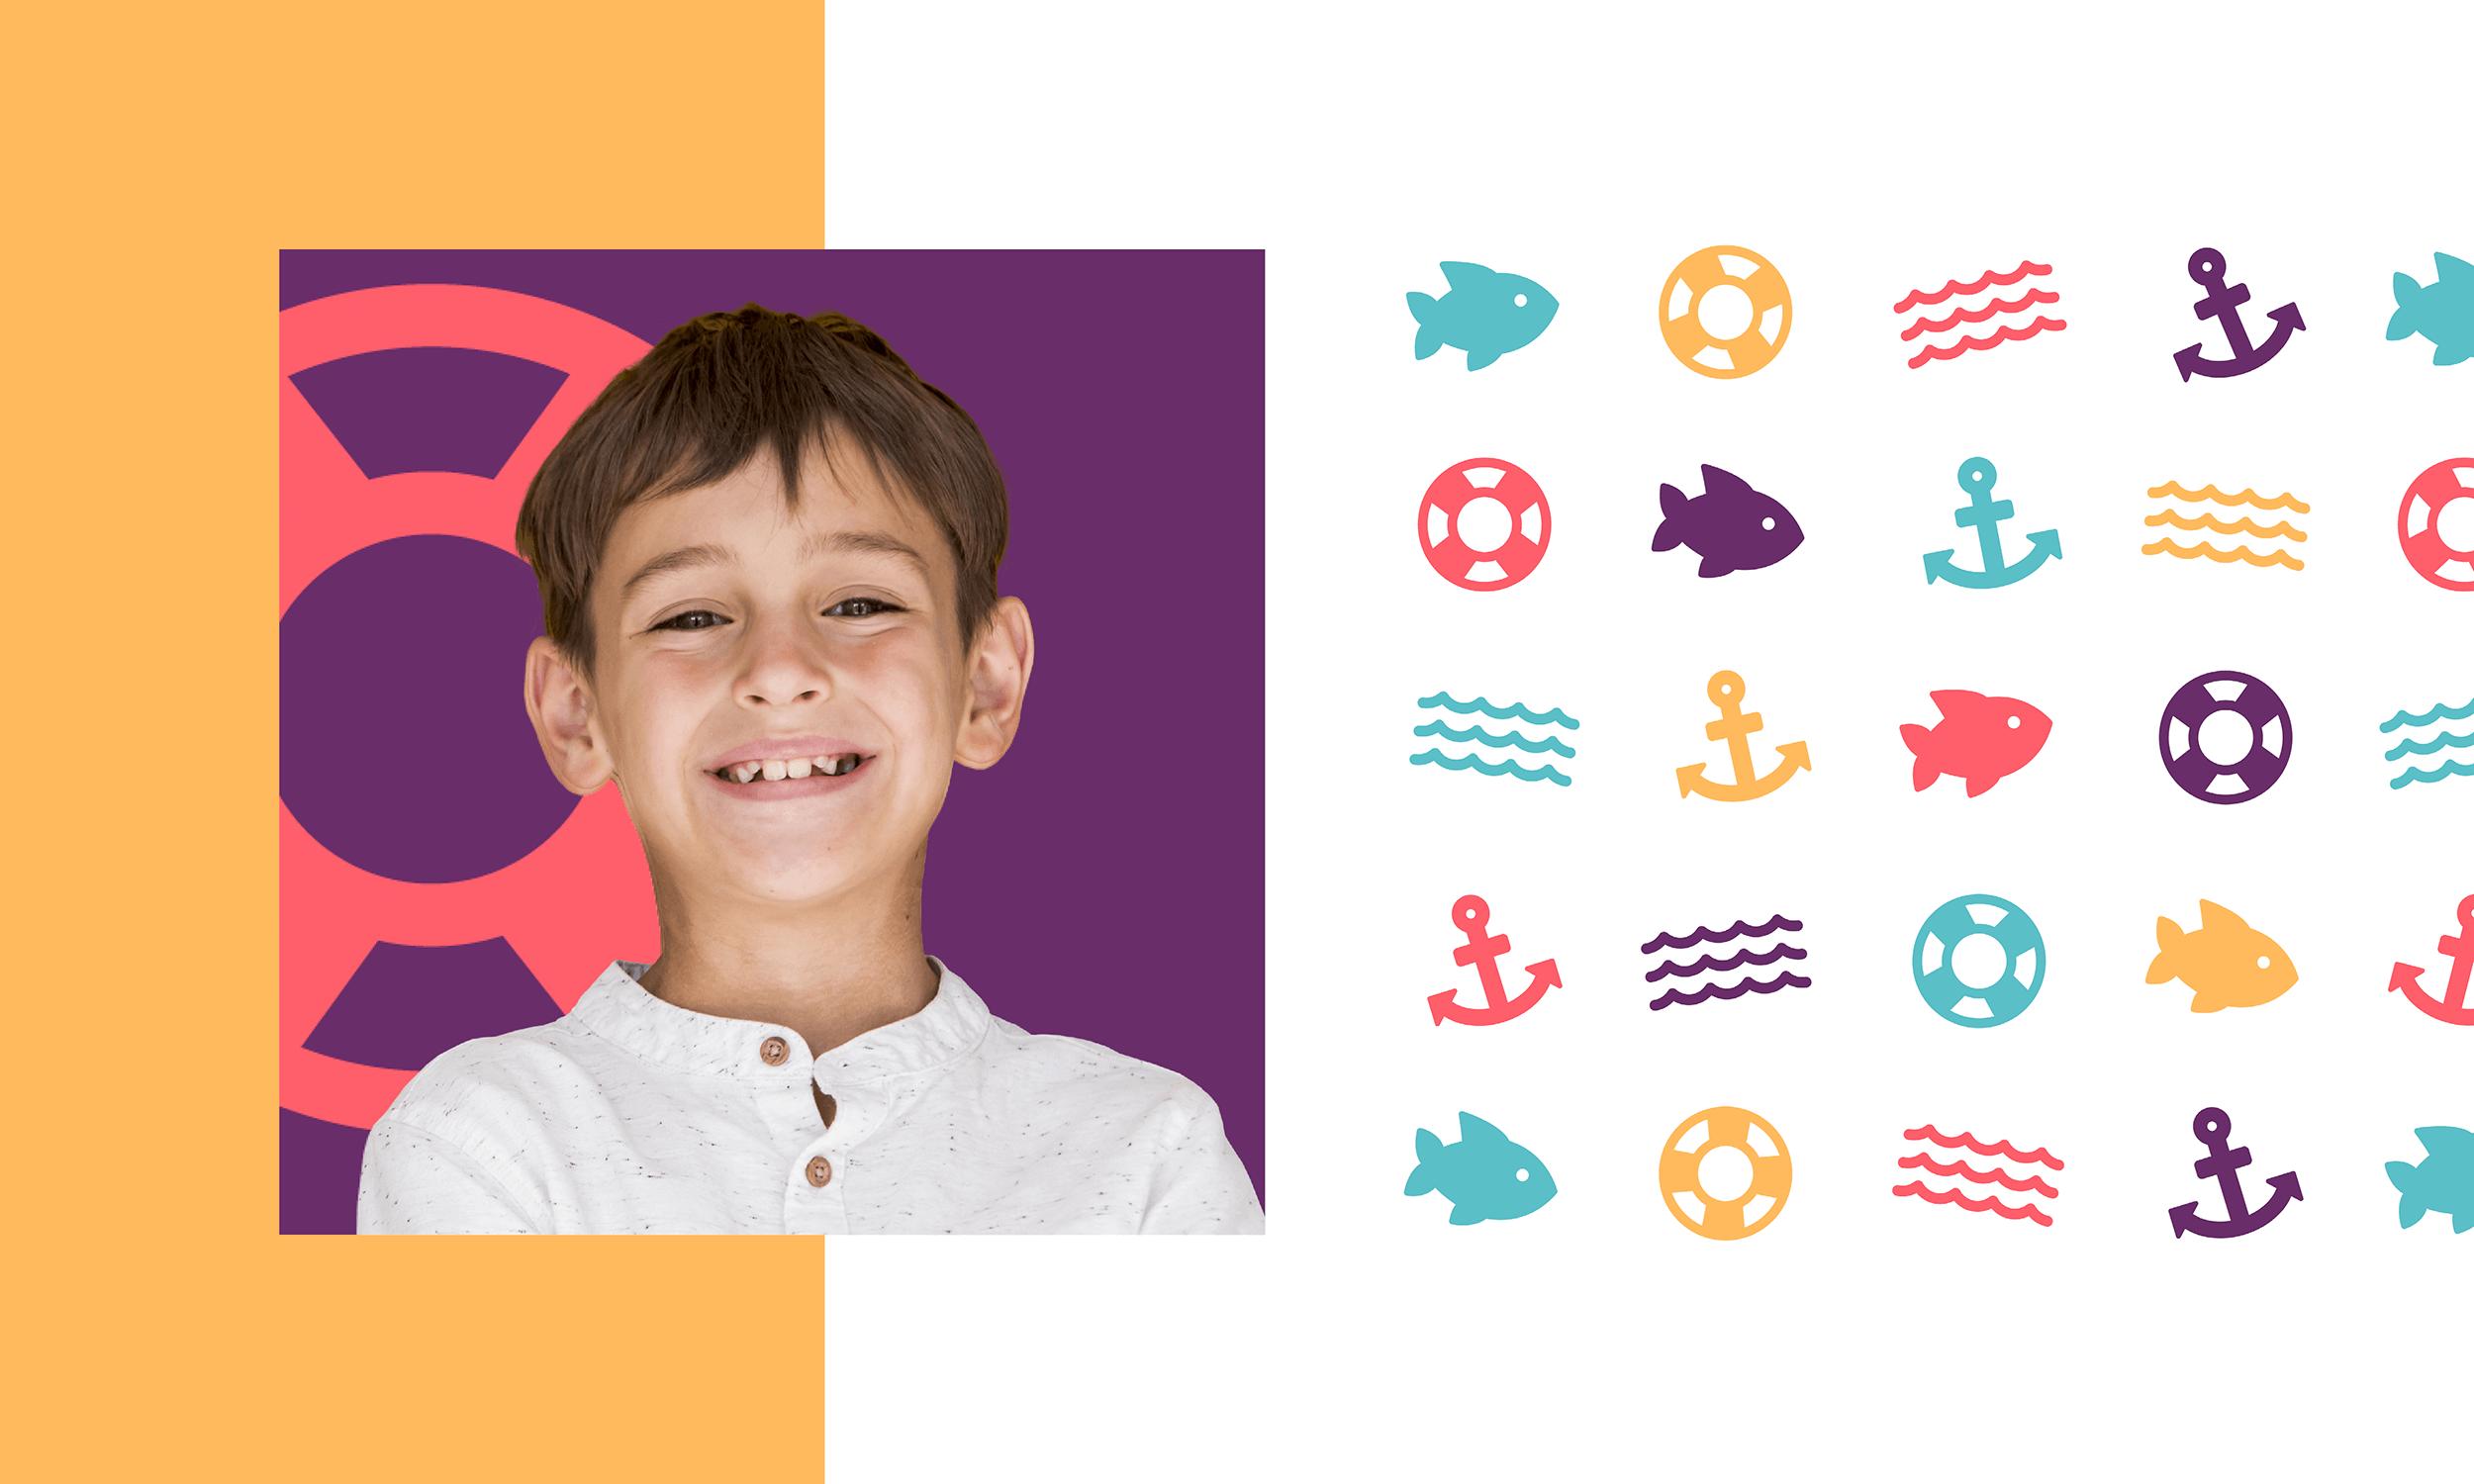 Capistrano-Childrens-Dentistry-Logo-Design-Freelance-Graphic-Designer-Margate-Kent-Presentation-Pediatric-Dental-Icons